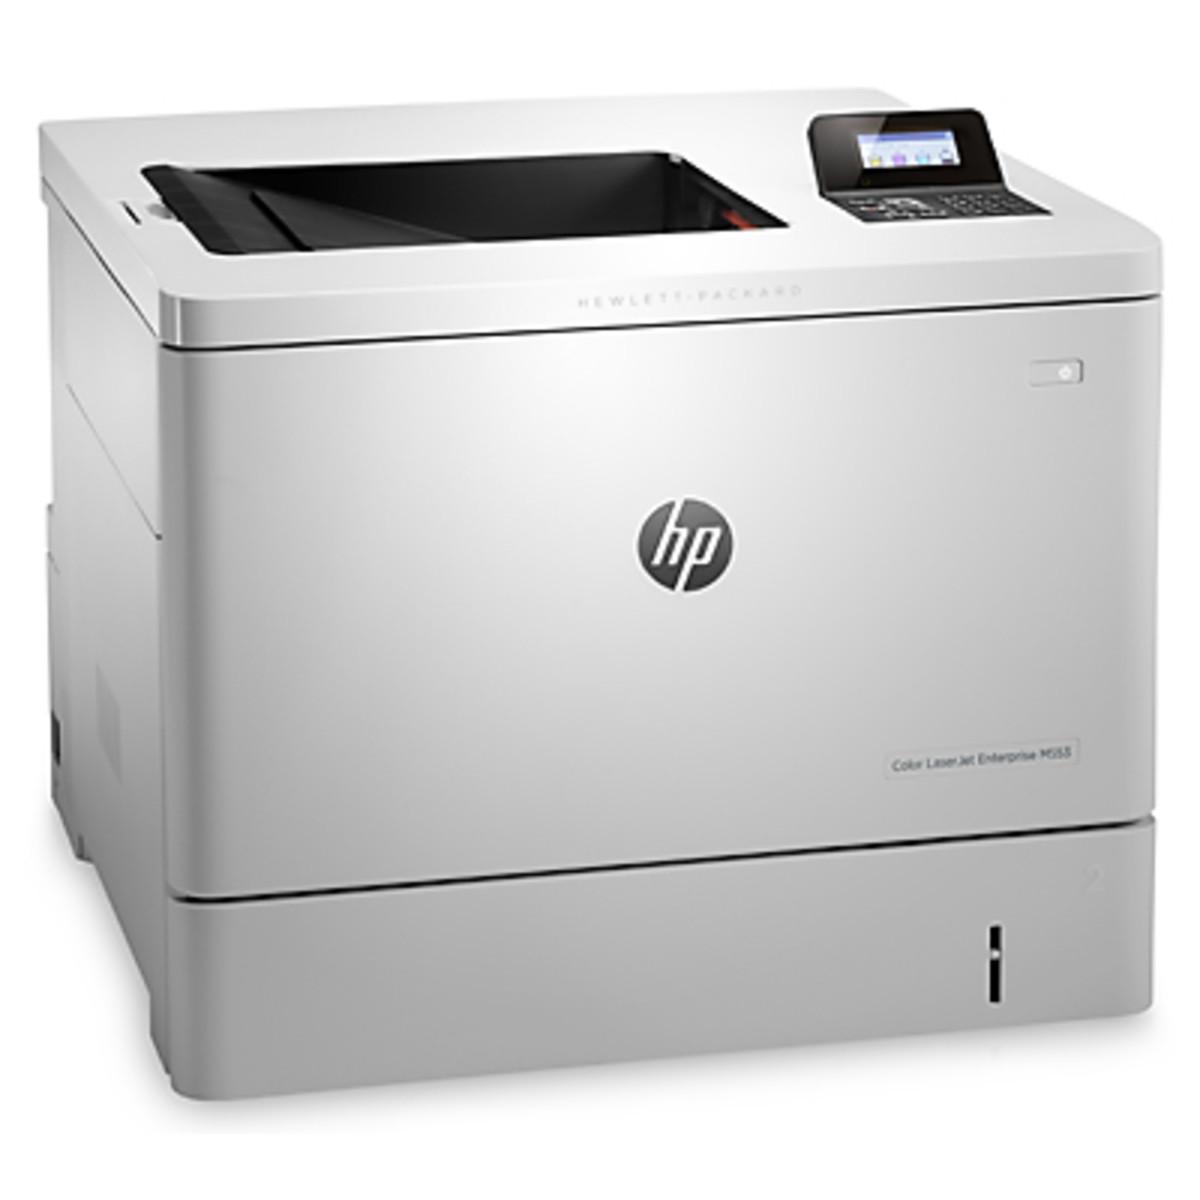 HP Laserjet M552dn Laser Printer